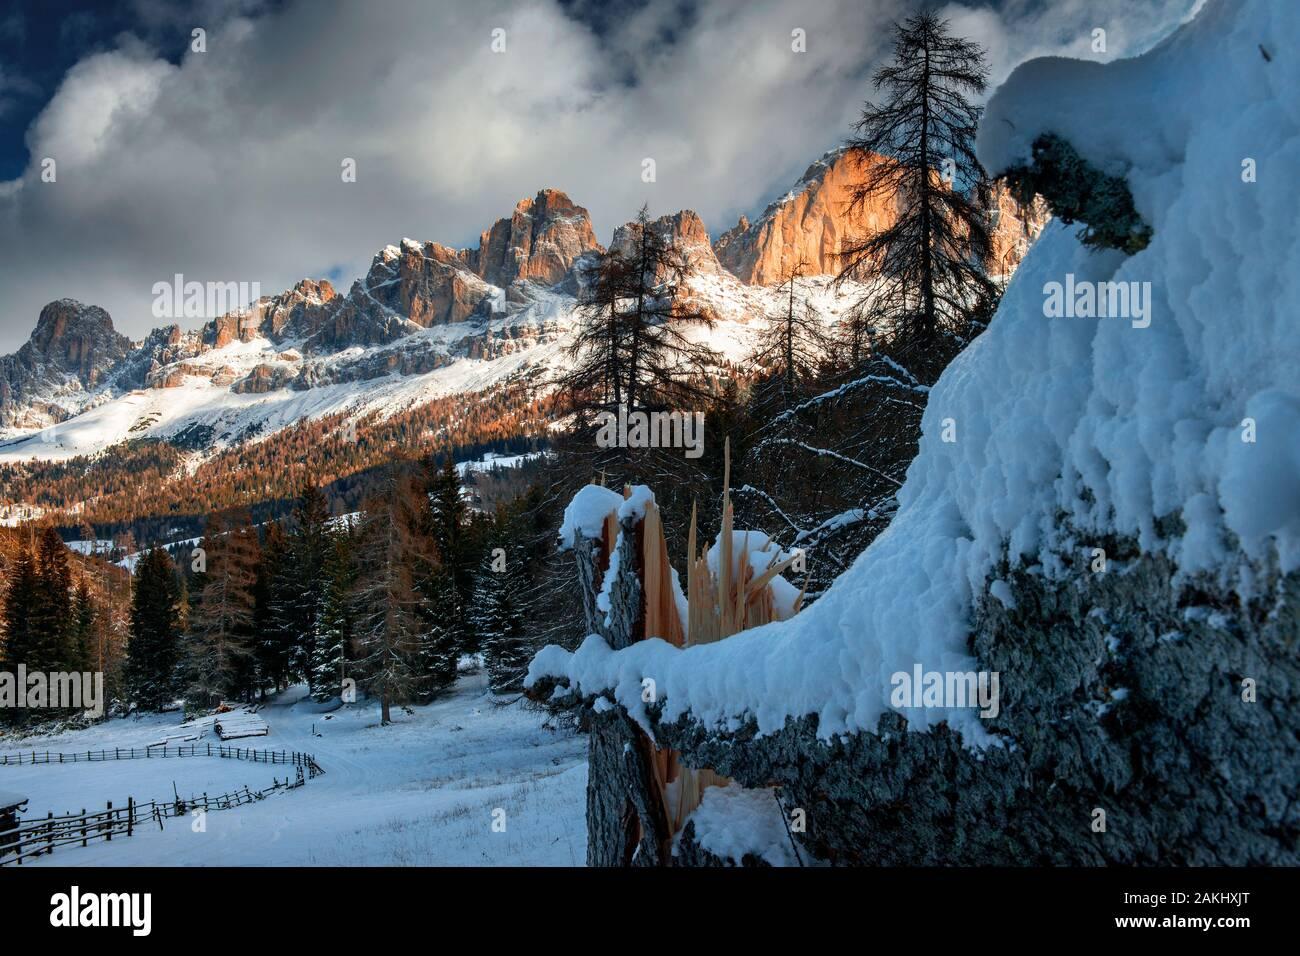 Carezza en los Dolomitas tras la fuerte tormenta Foto de stock